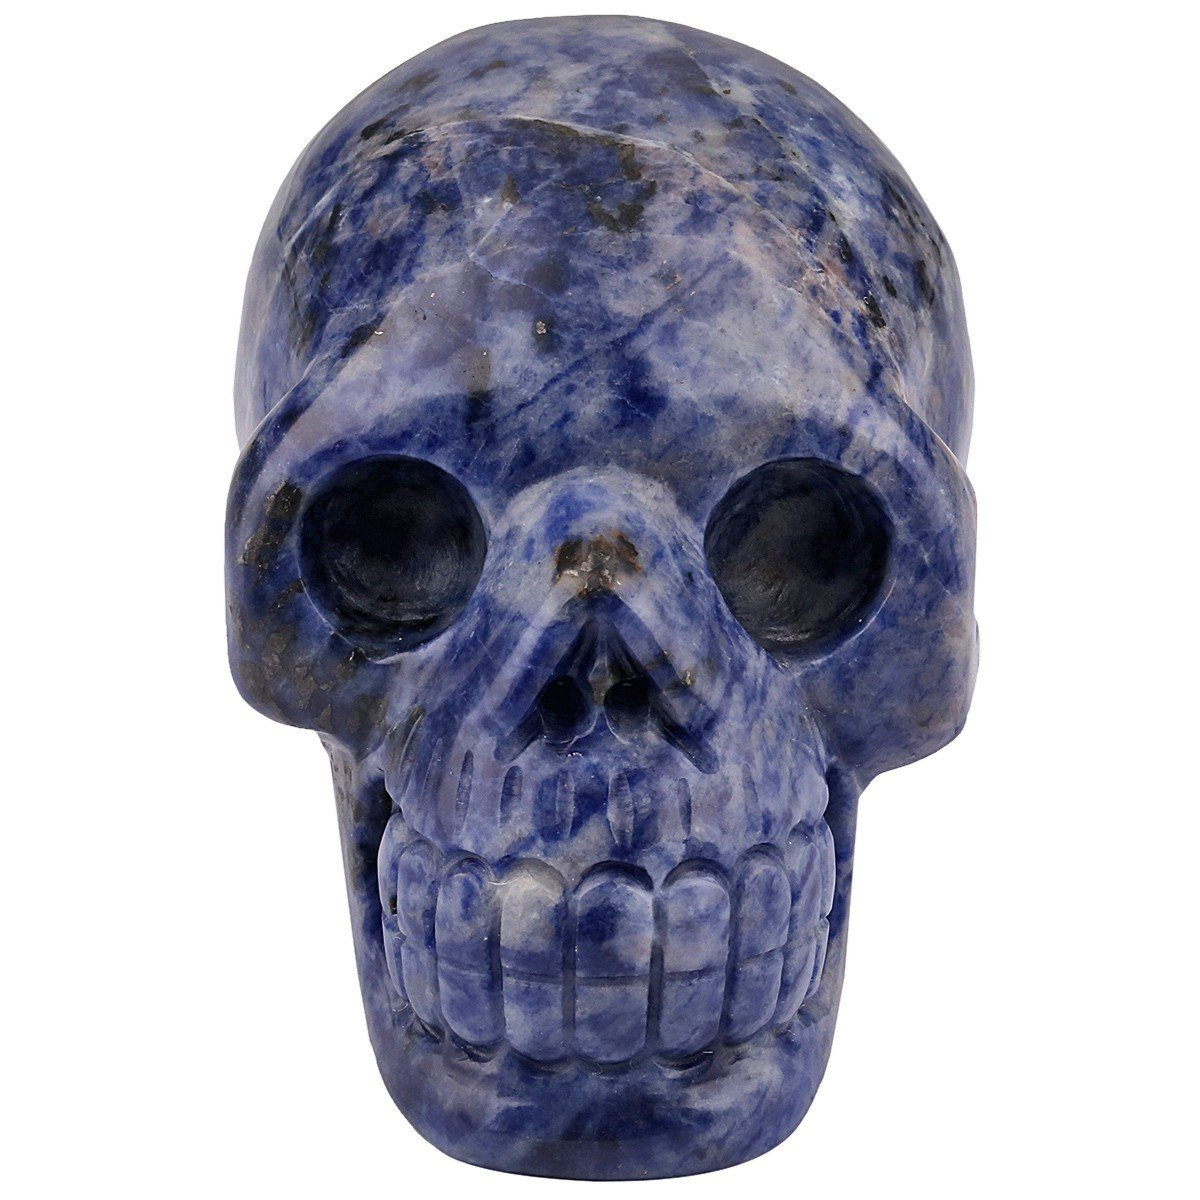 rockcloud Healing Crystal Stone Human Reiki Skull Figurine Statue Sculptures Sodalite 3